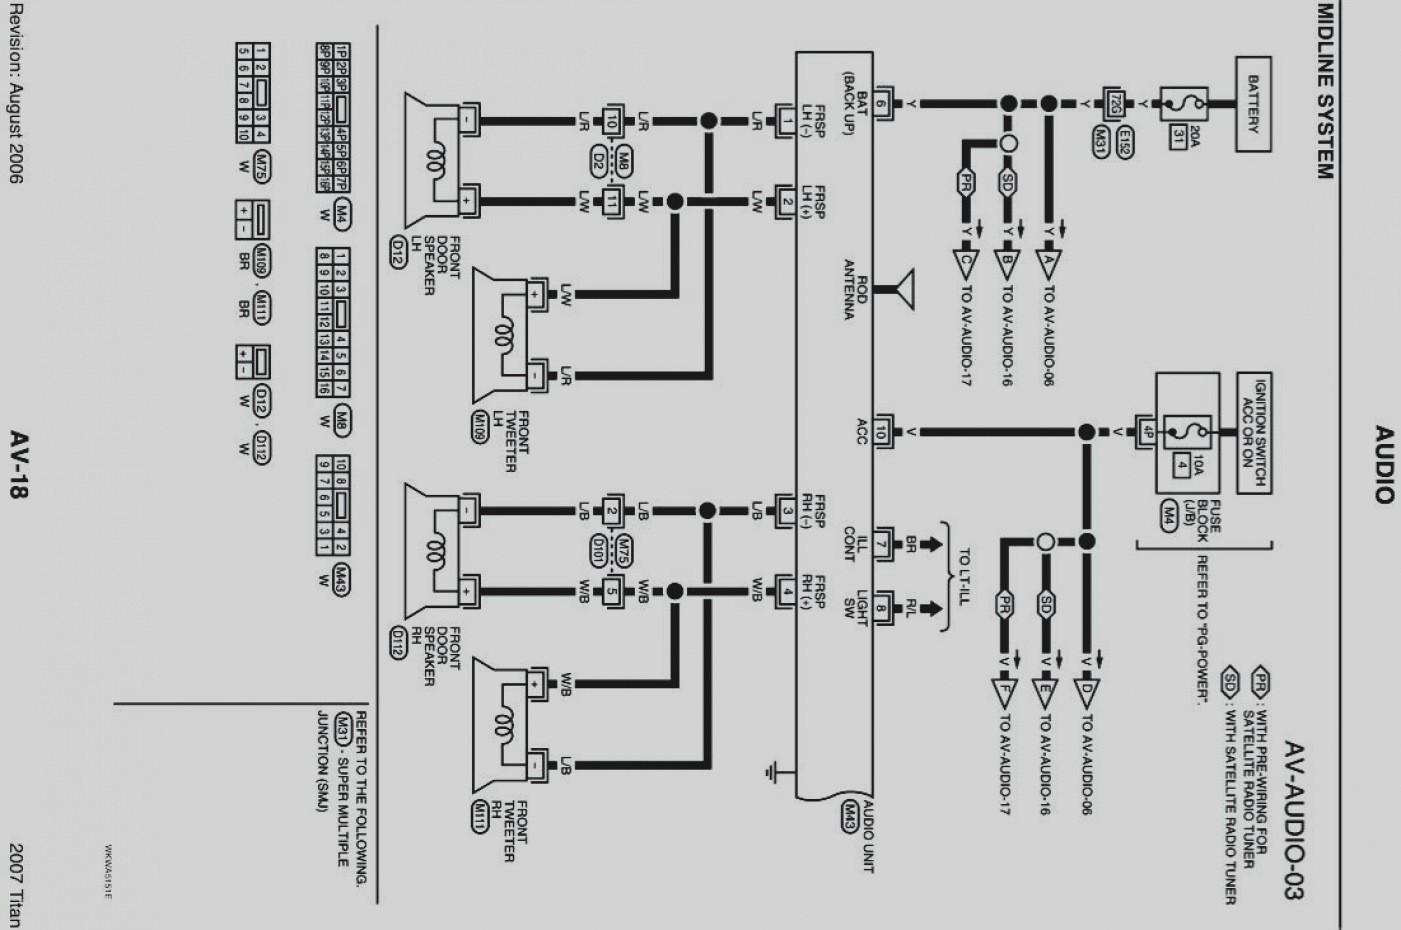 Nissan Titan Wiring Harness Diagram Great Design Of Xterra Trailer Speaker Wire Colors Coloringsite Co Rh